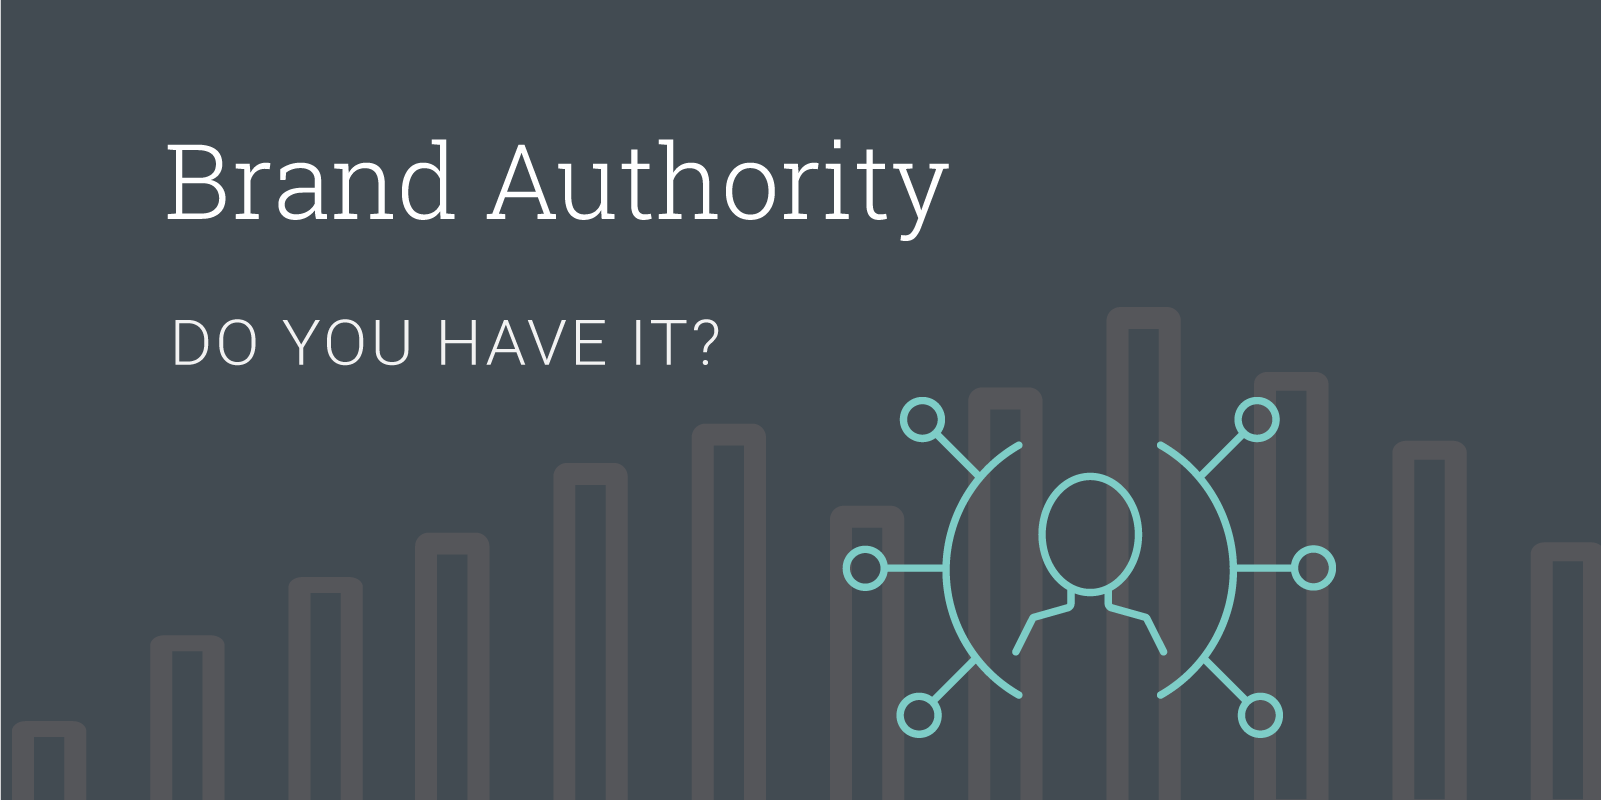 Measuring-brand-authority